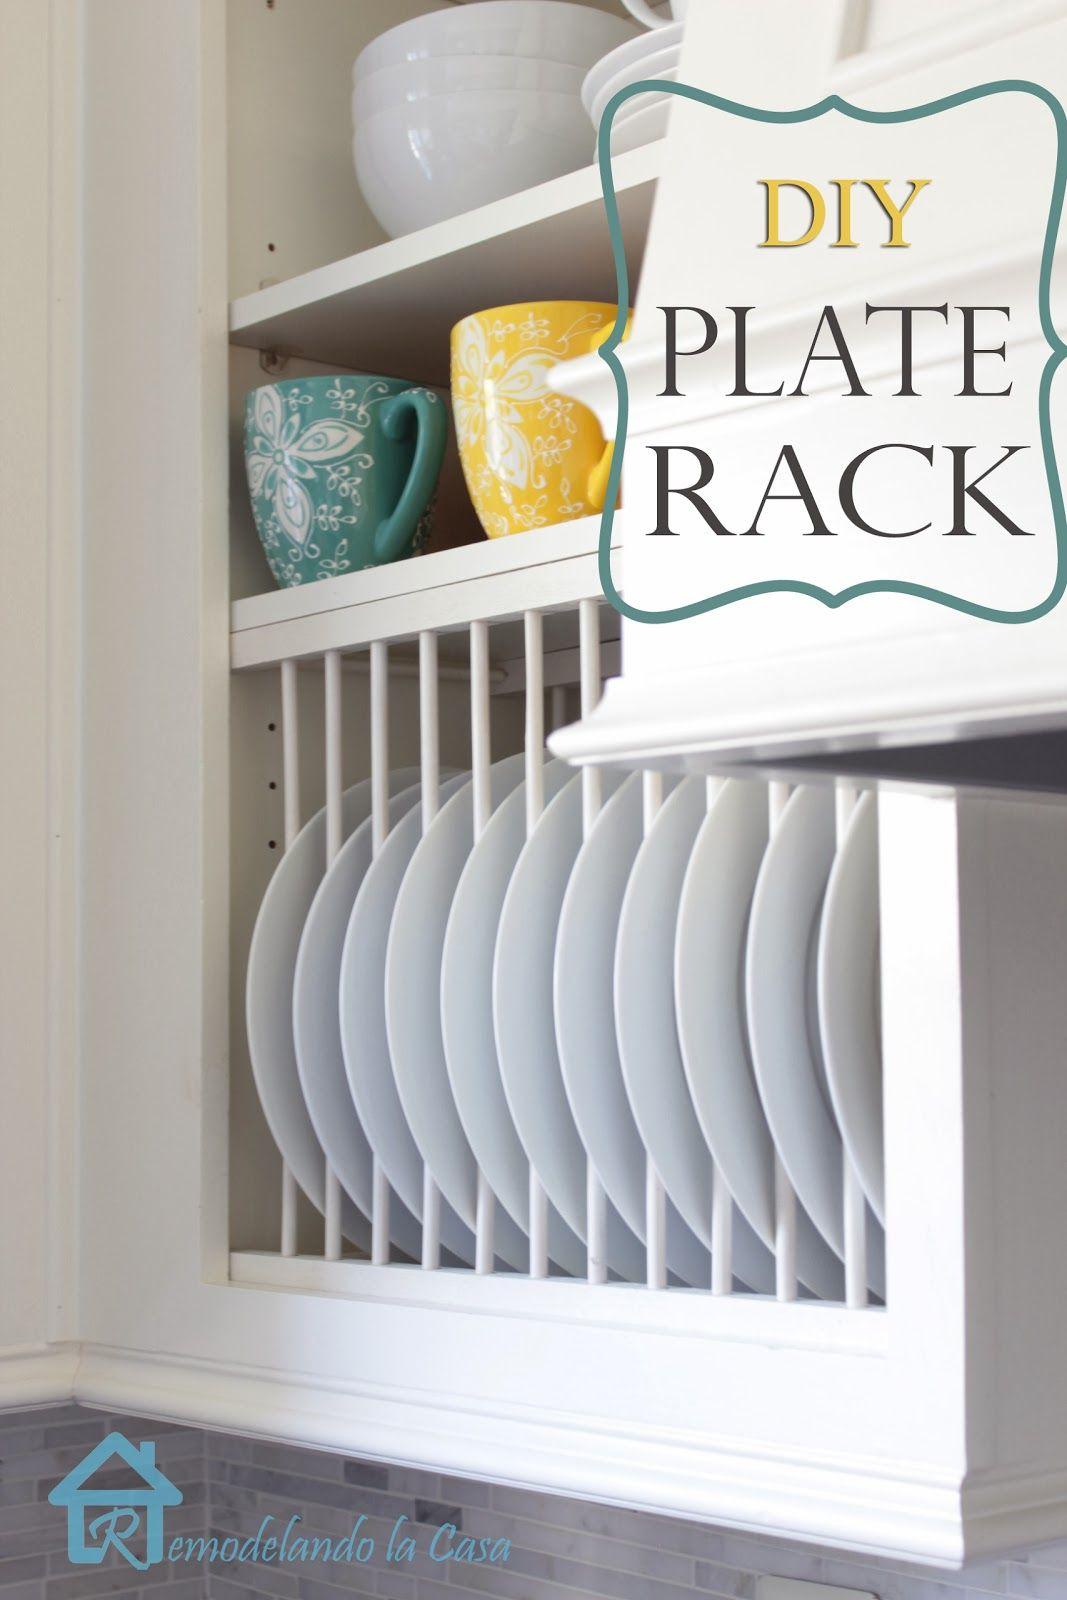 Kitchen Organization Diy Plate Rack Inside Cabinet Diy Plate Rack Diy Kitchen Diy Kitchen Projects